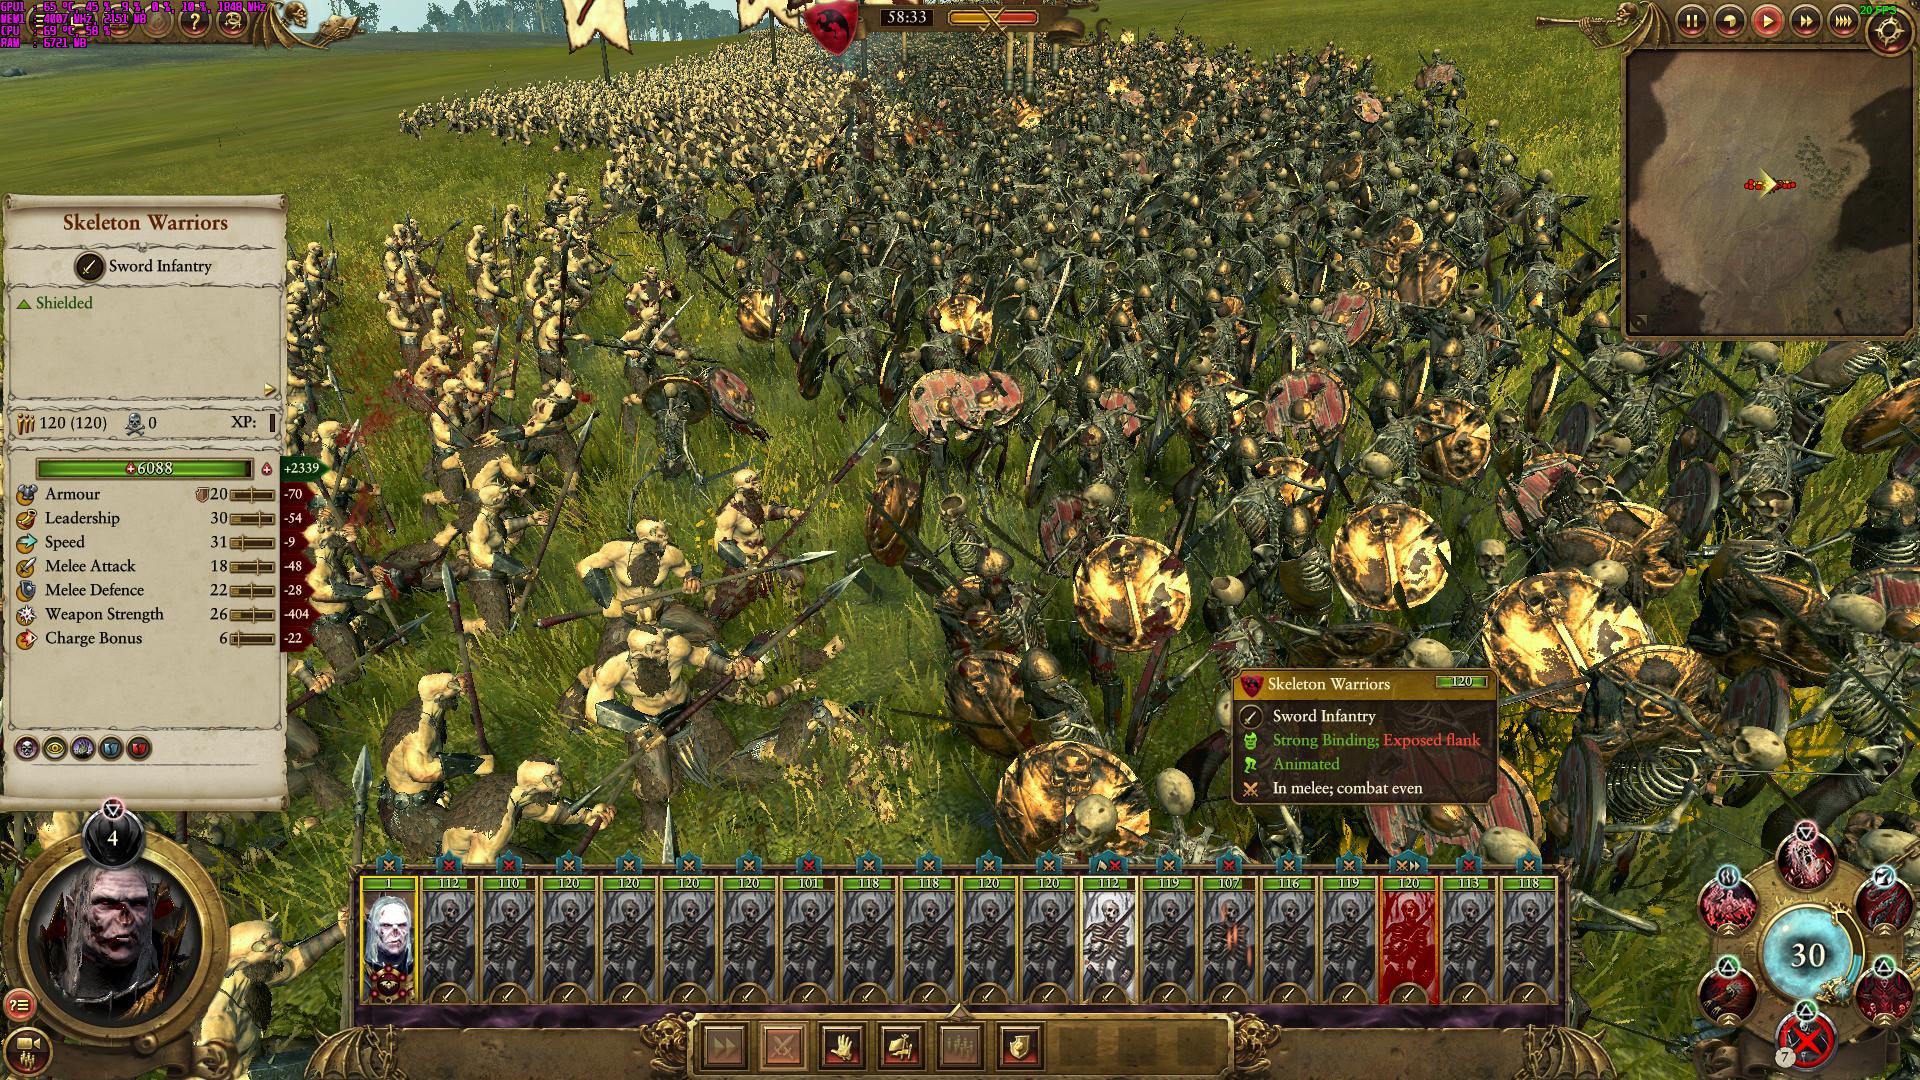 FPS drops during battles - Page 2 — Total War Forums